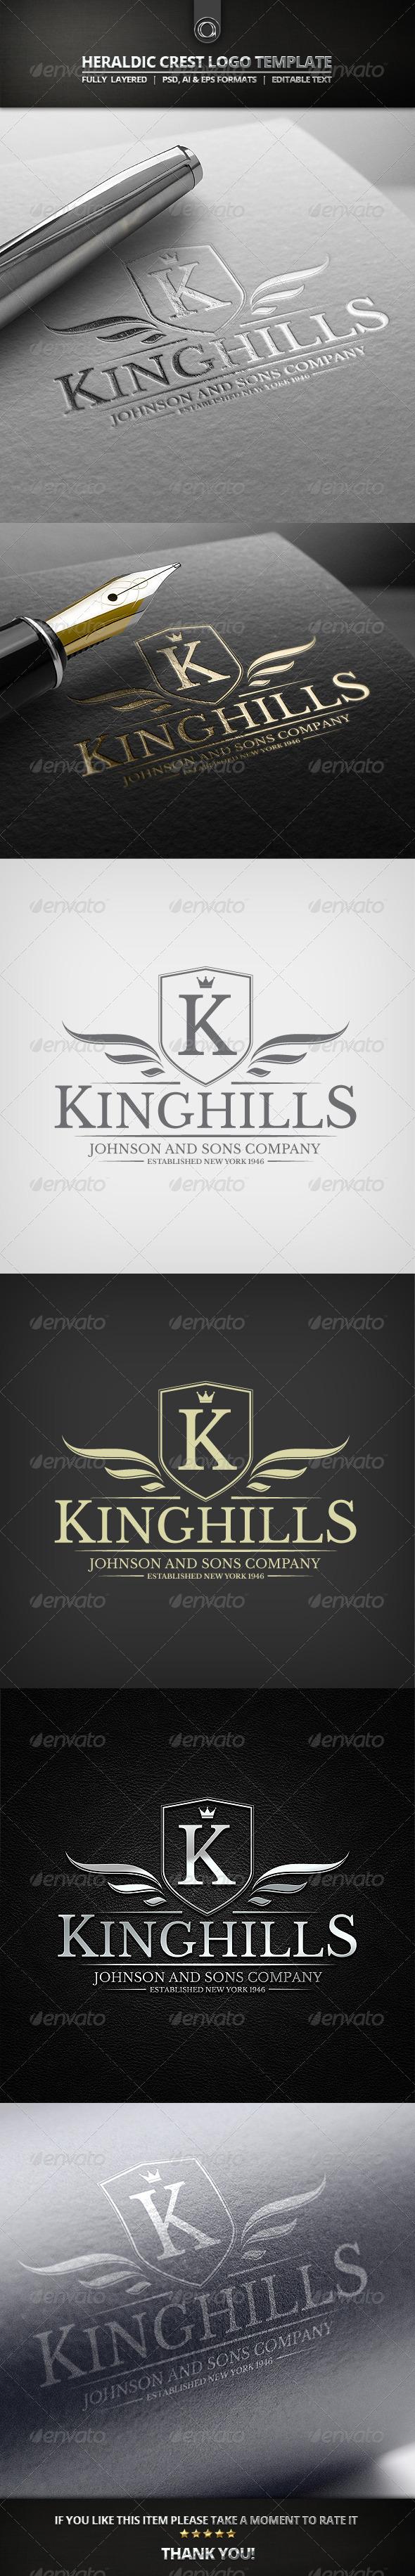 GraphicRiver Heraldic Crest Logo Template 7675849